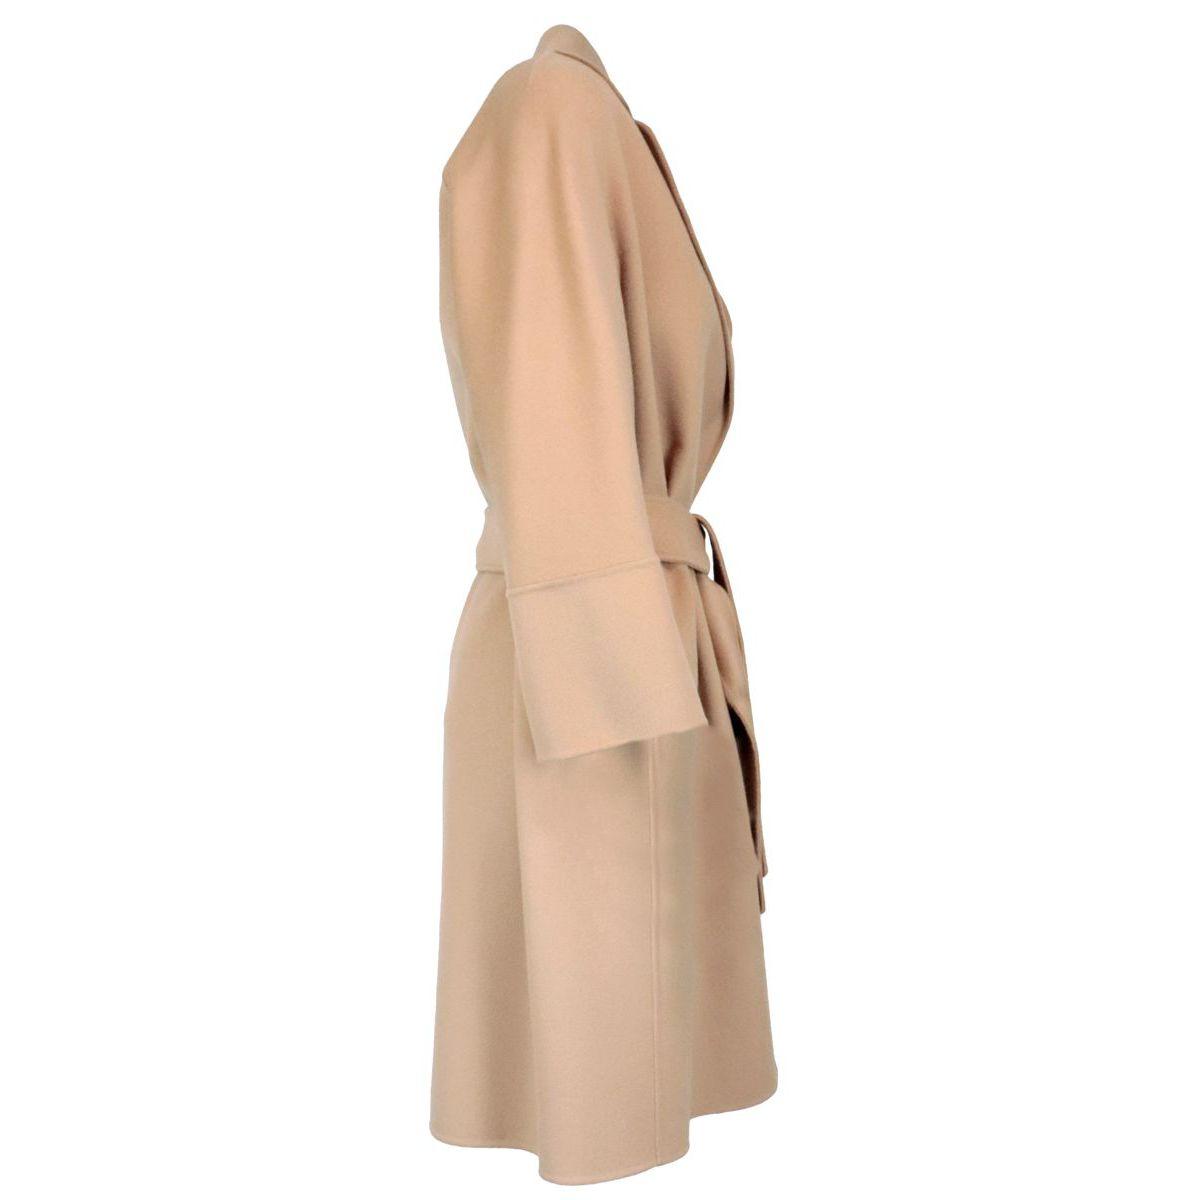 Belted coat in Arona wool Camel S MAX MARA